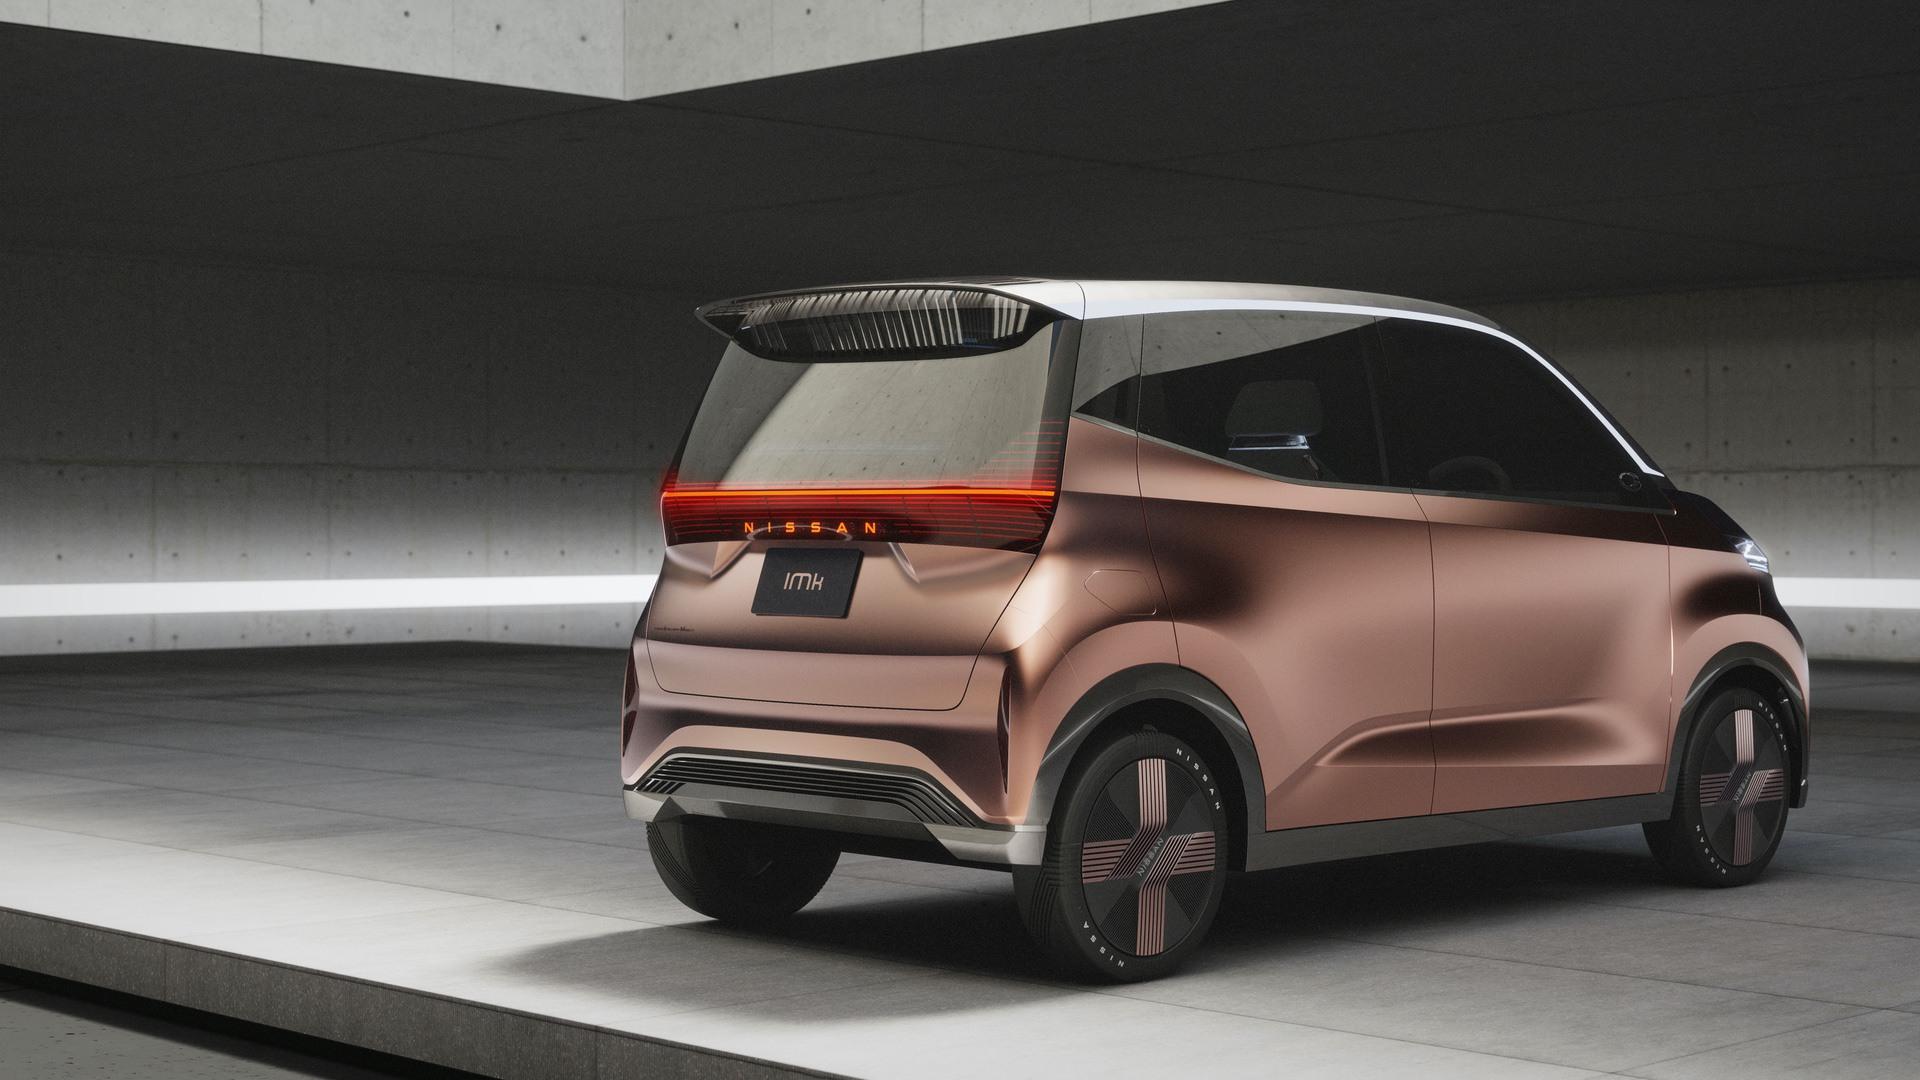 Nissan_IMk_Concept_0015